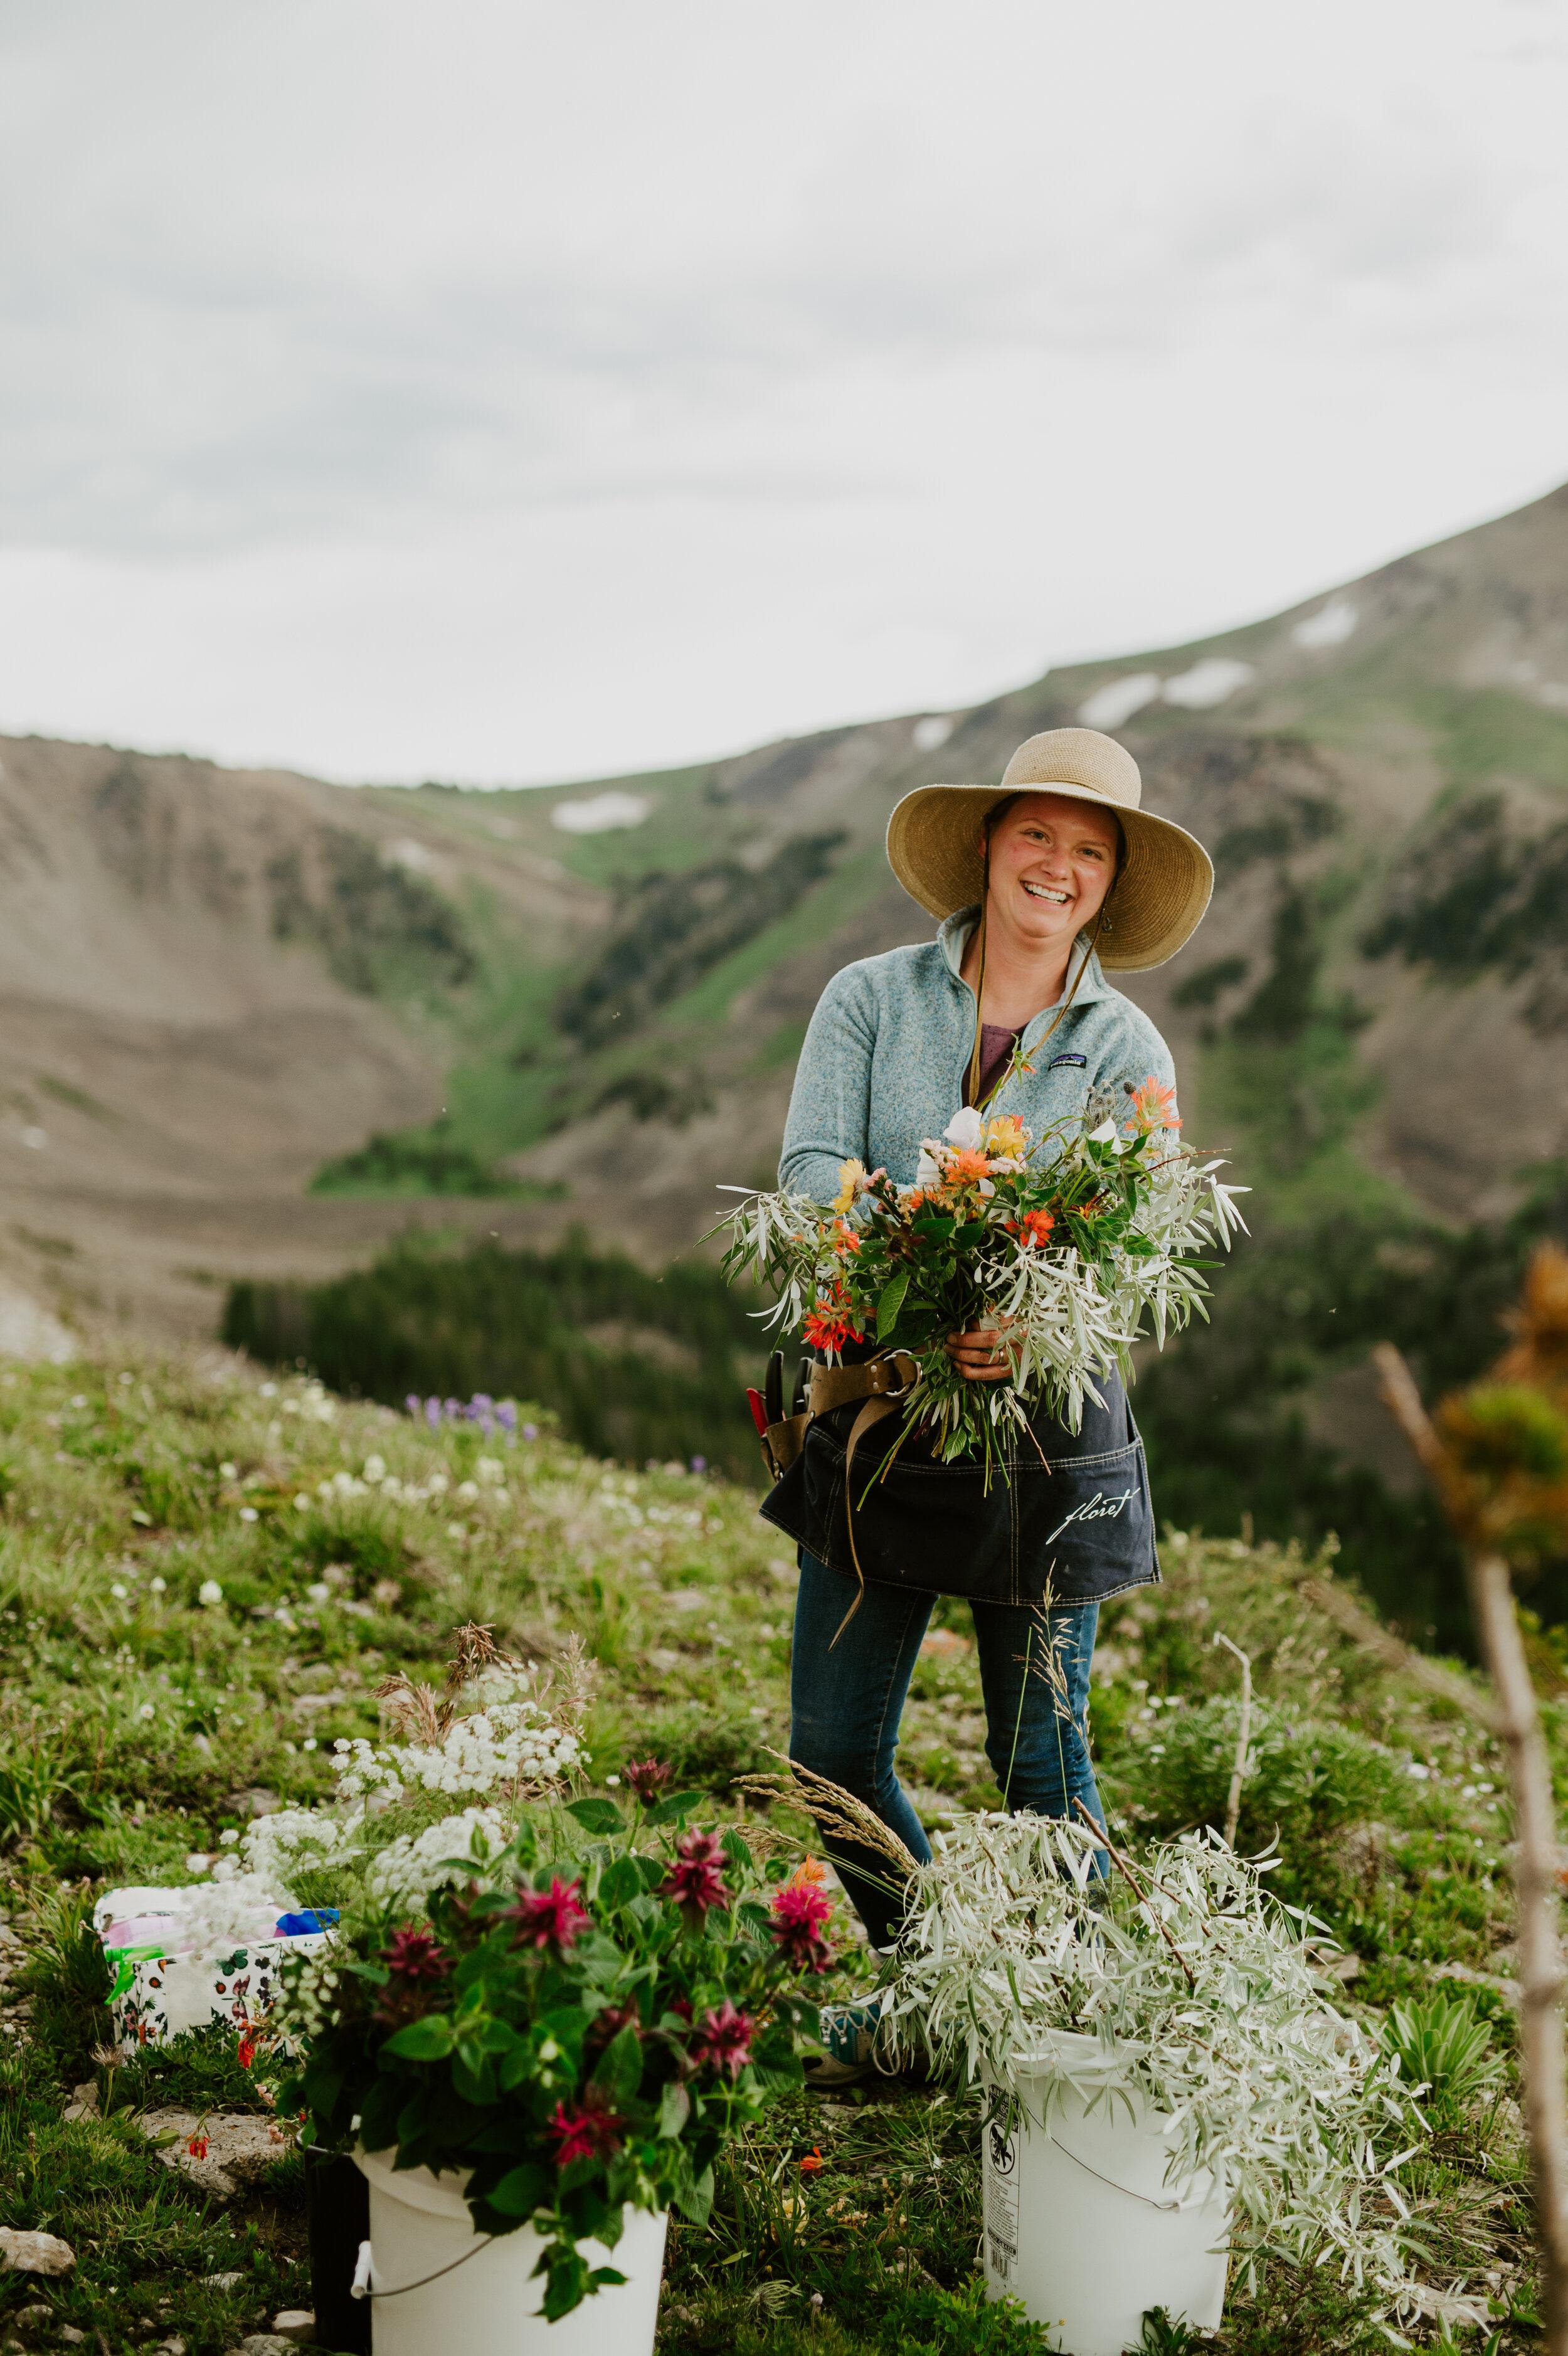 Melissa Urick Wedding Floral Designer Flower Farmer Wyoming